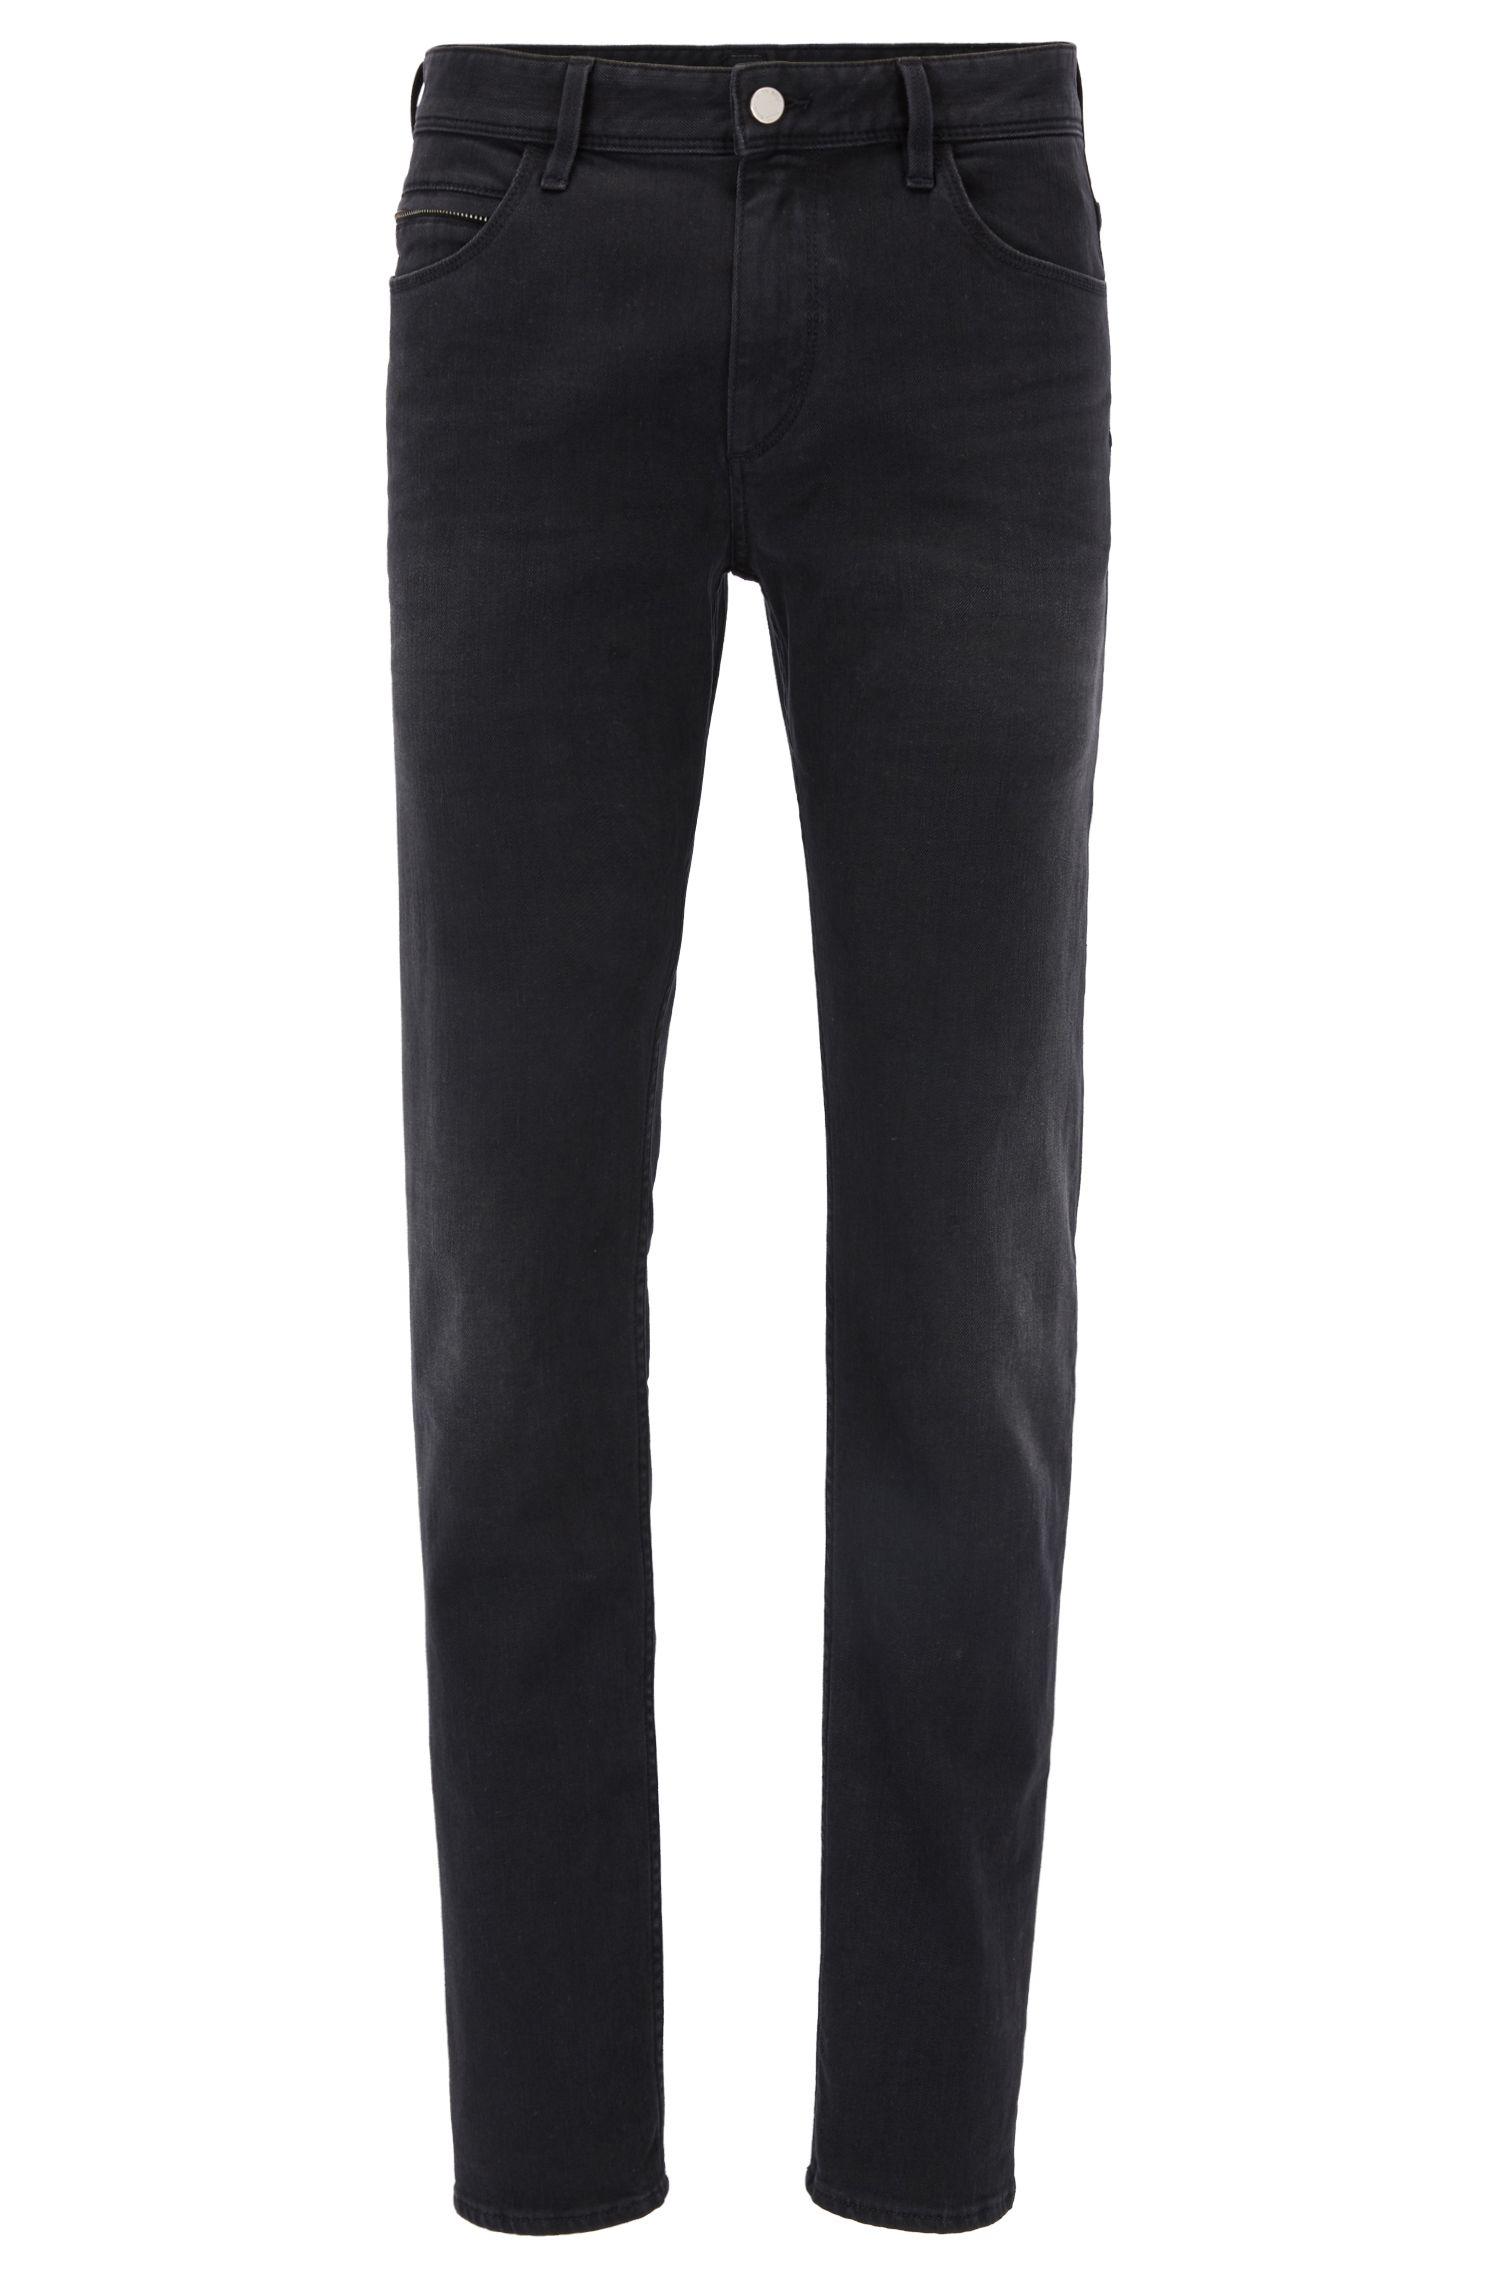 Mercedes-Benz Stretch Cotton Jean, Slim Fit | Delaware